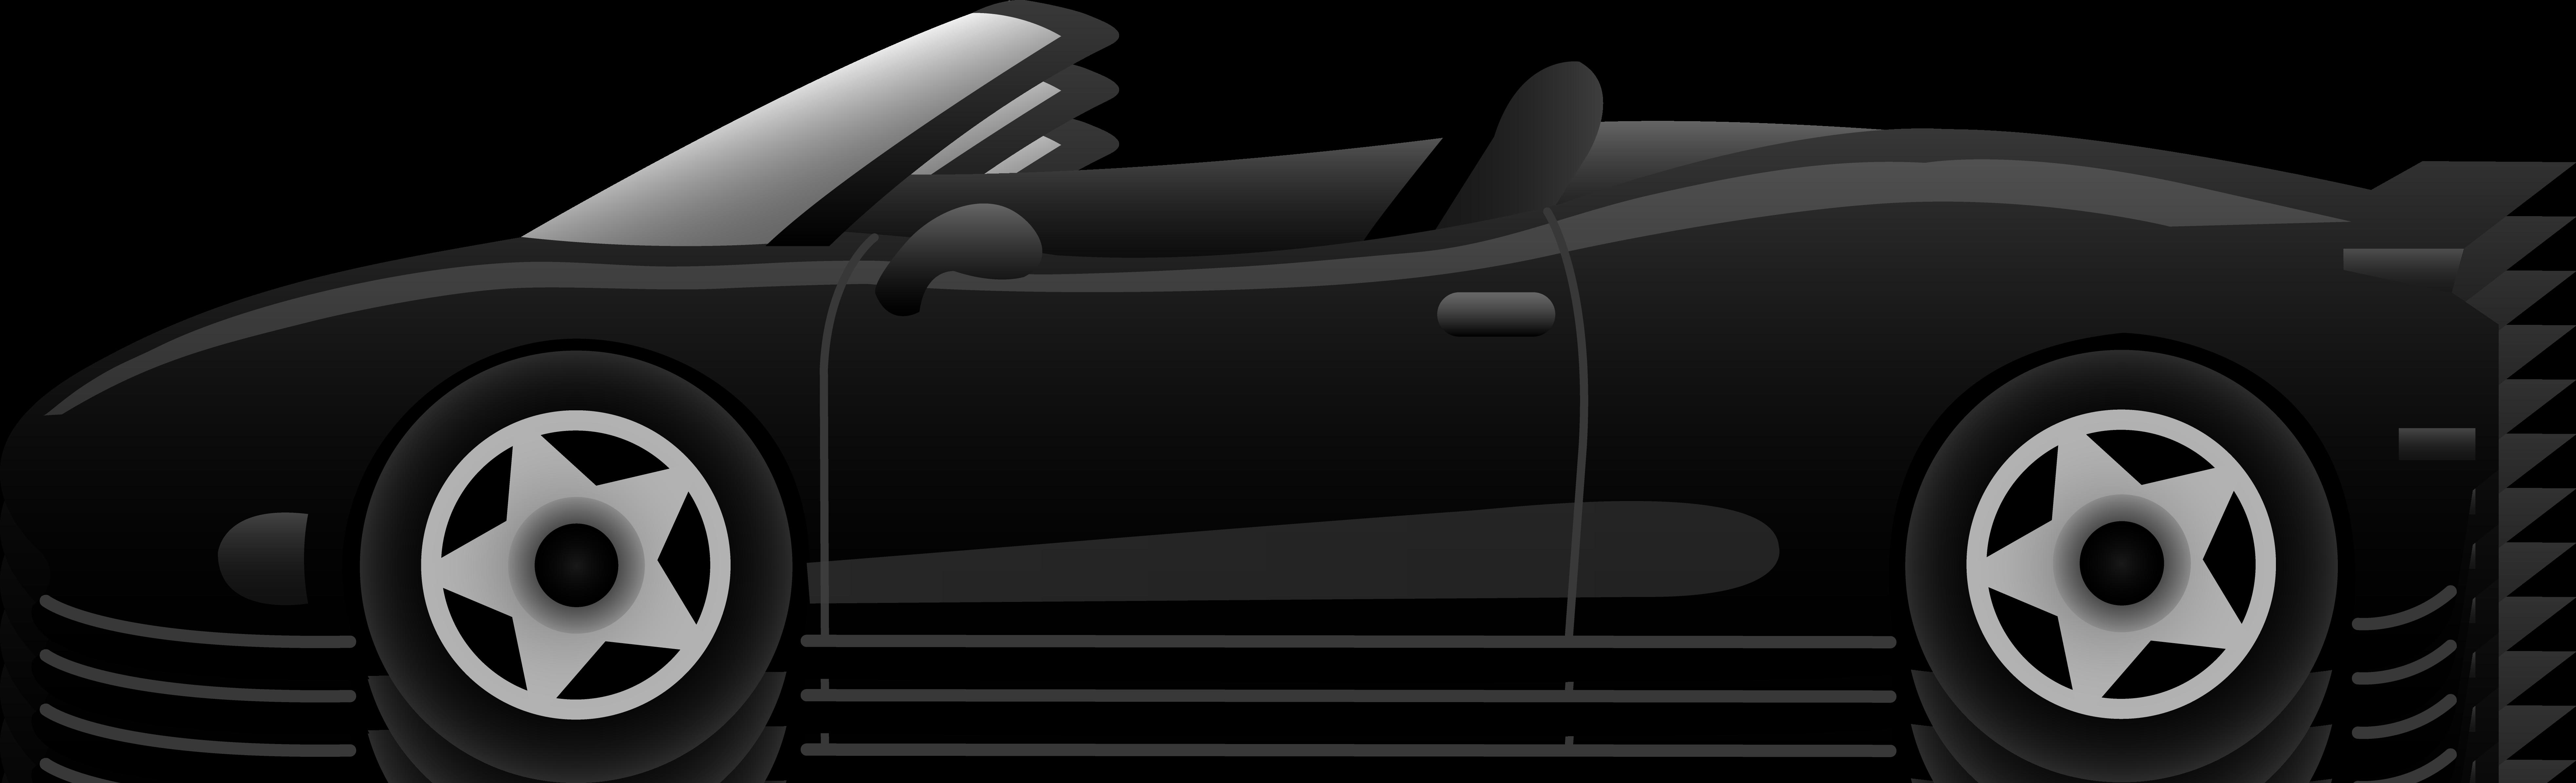 Black sports panda free. Clipart car sport